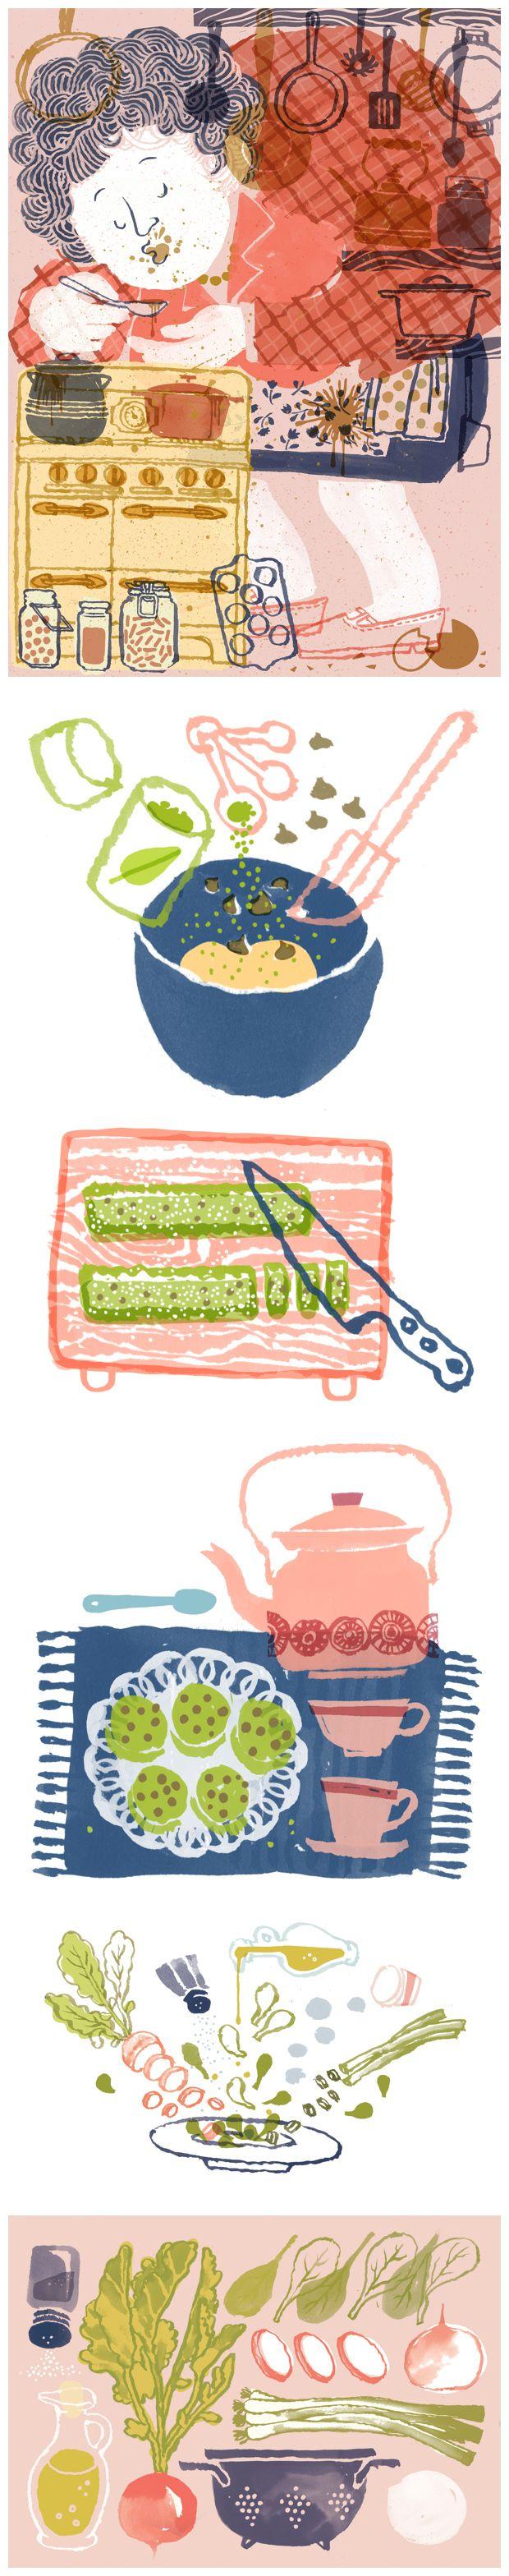 Food Parade by Hayelin Choi